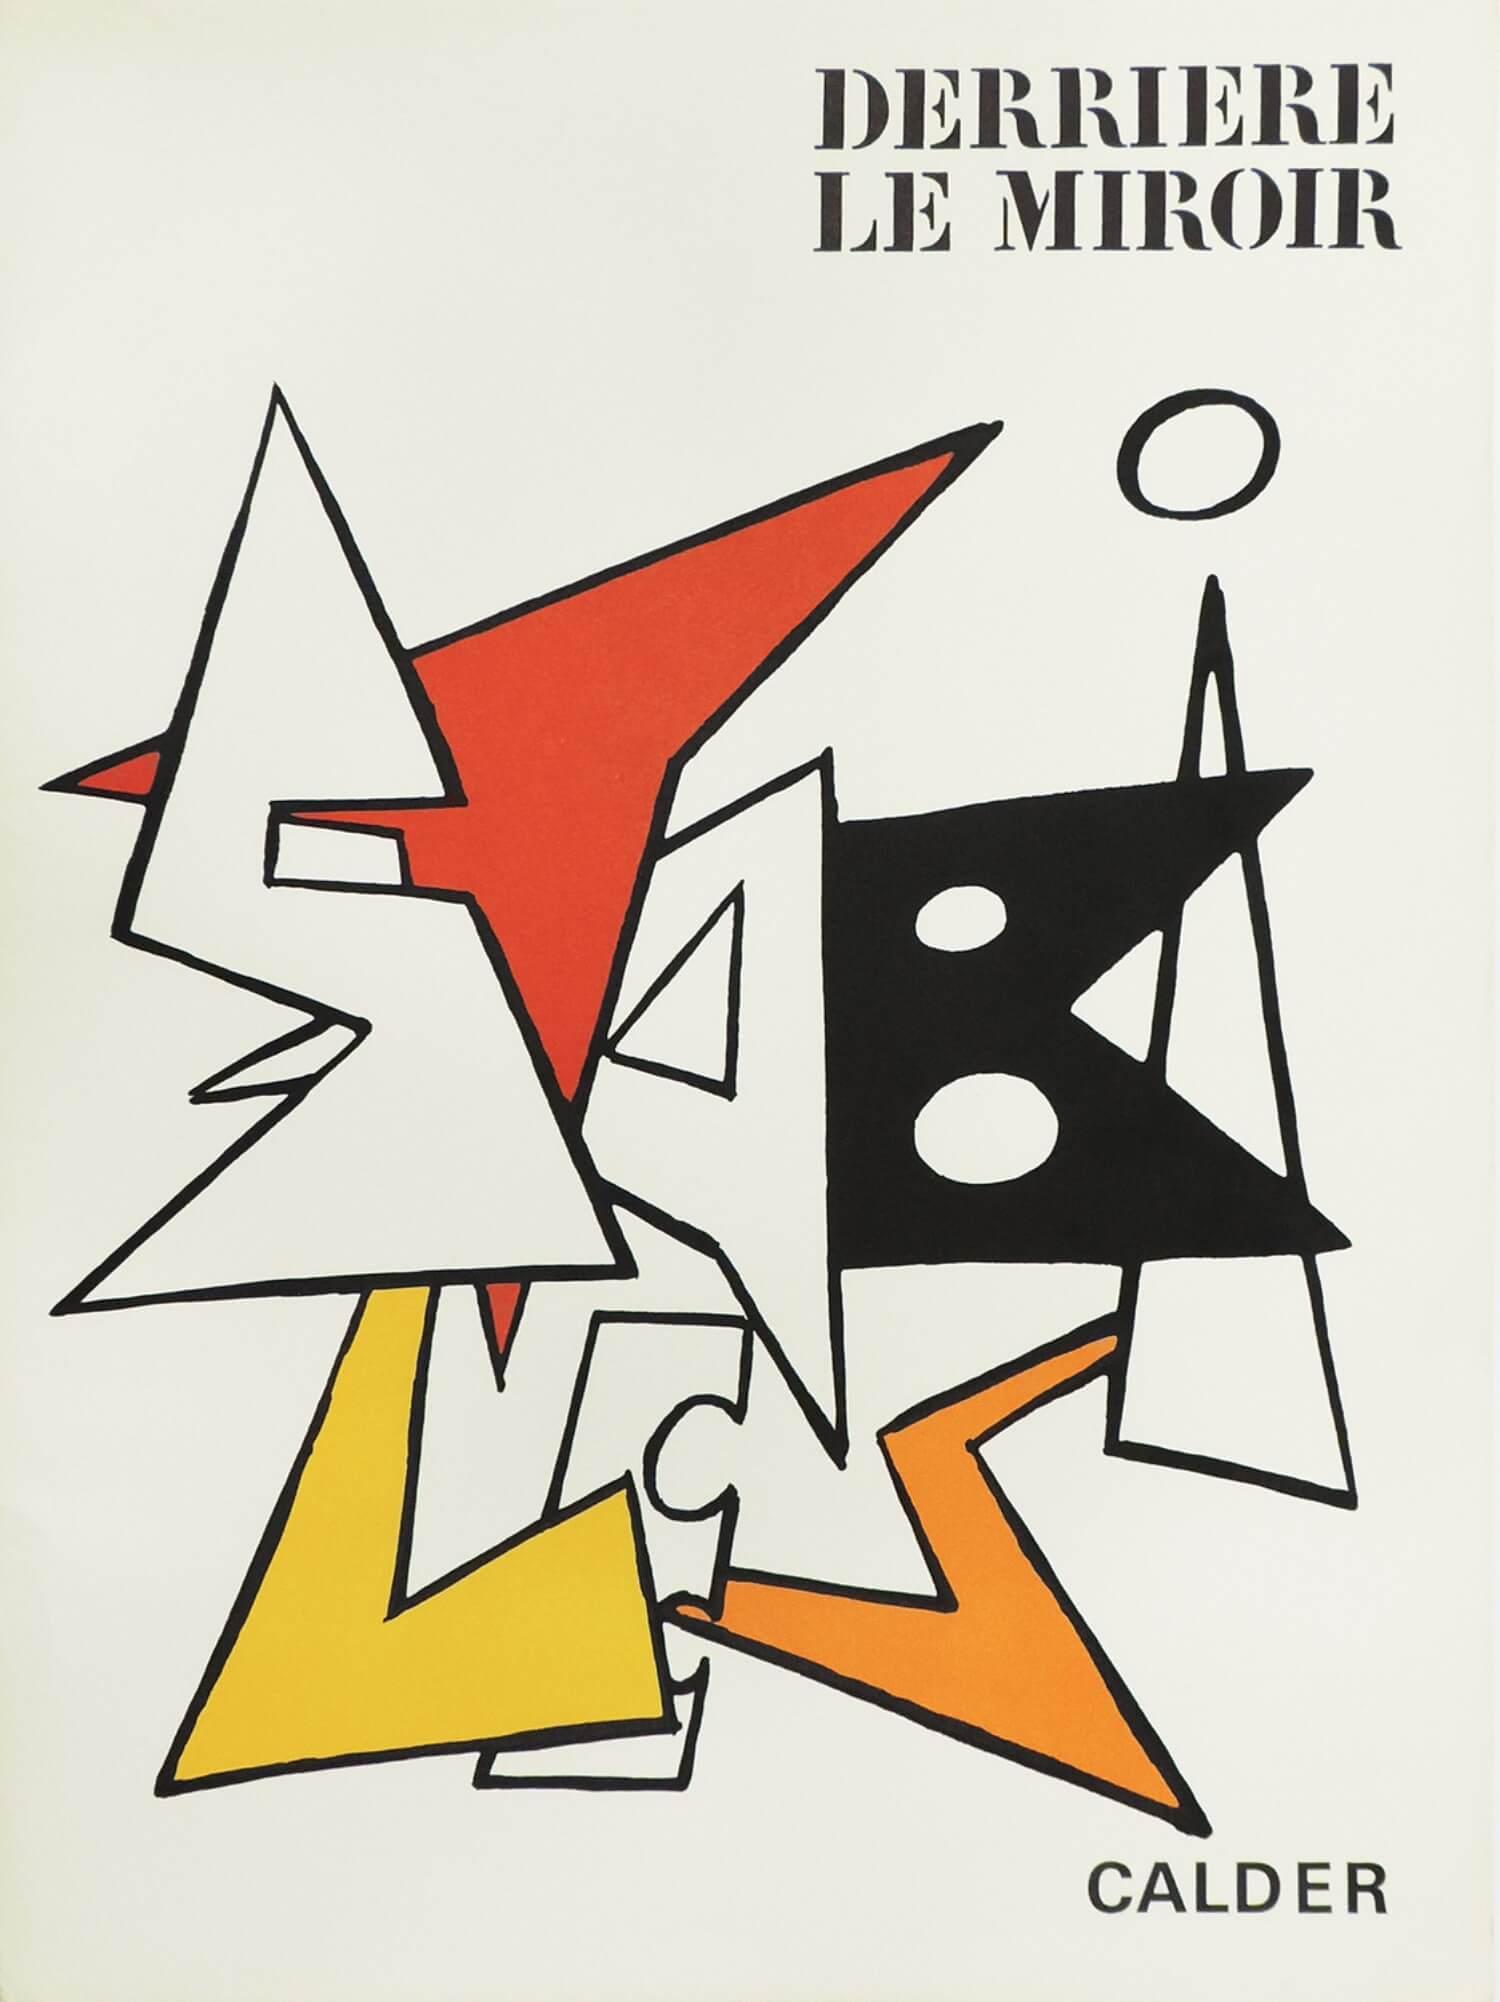 Alexander Calder<br>lithograph, 38.2 x 28.4 x 0.5 cm, 1963